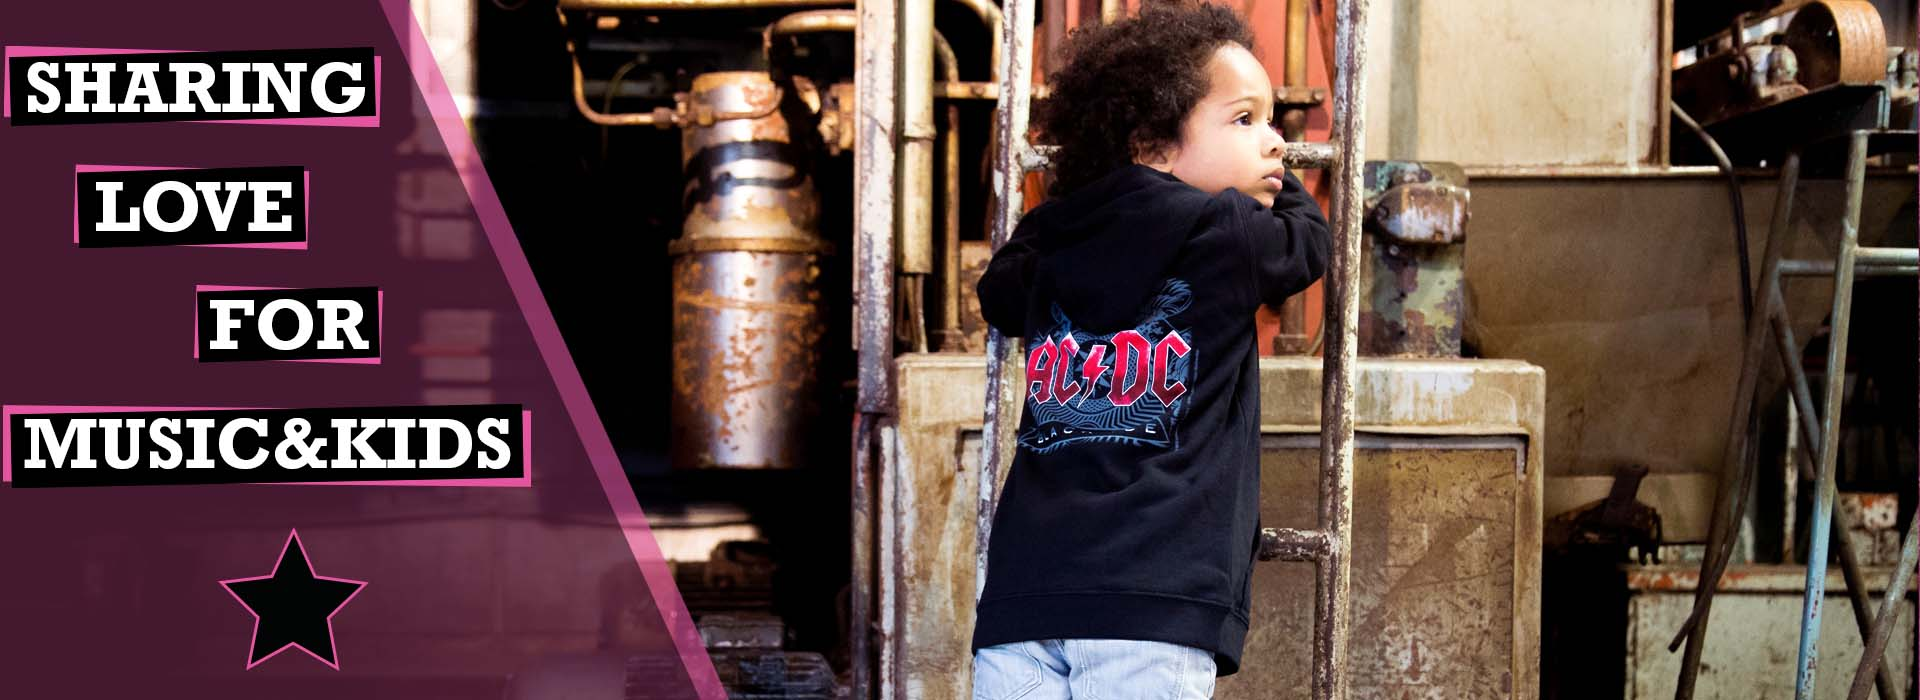 Metal børn tøj